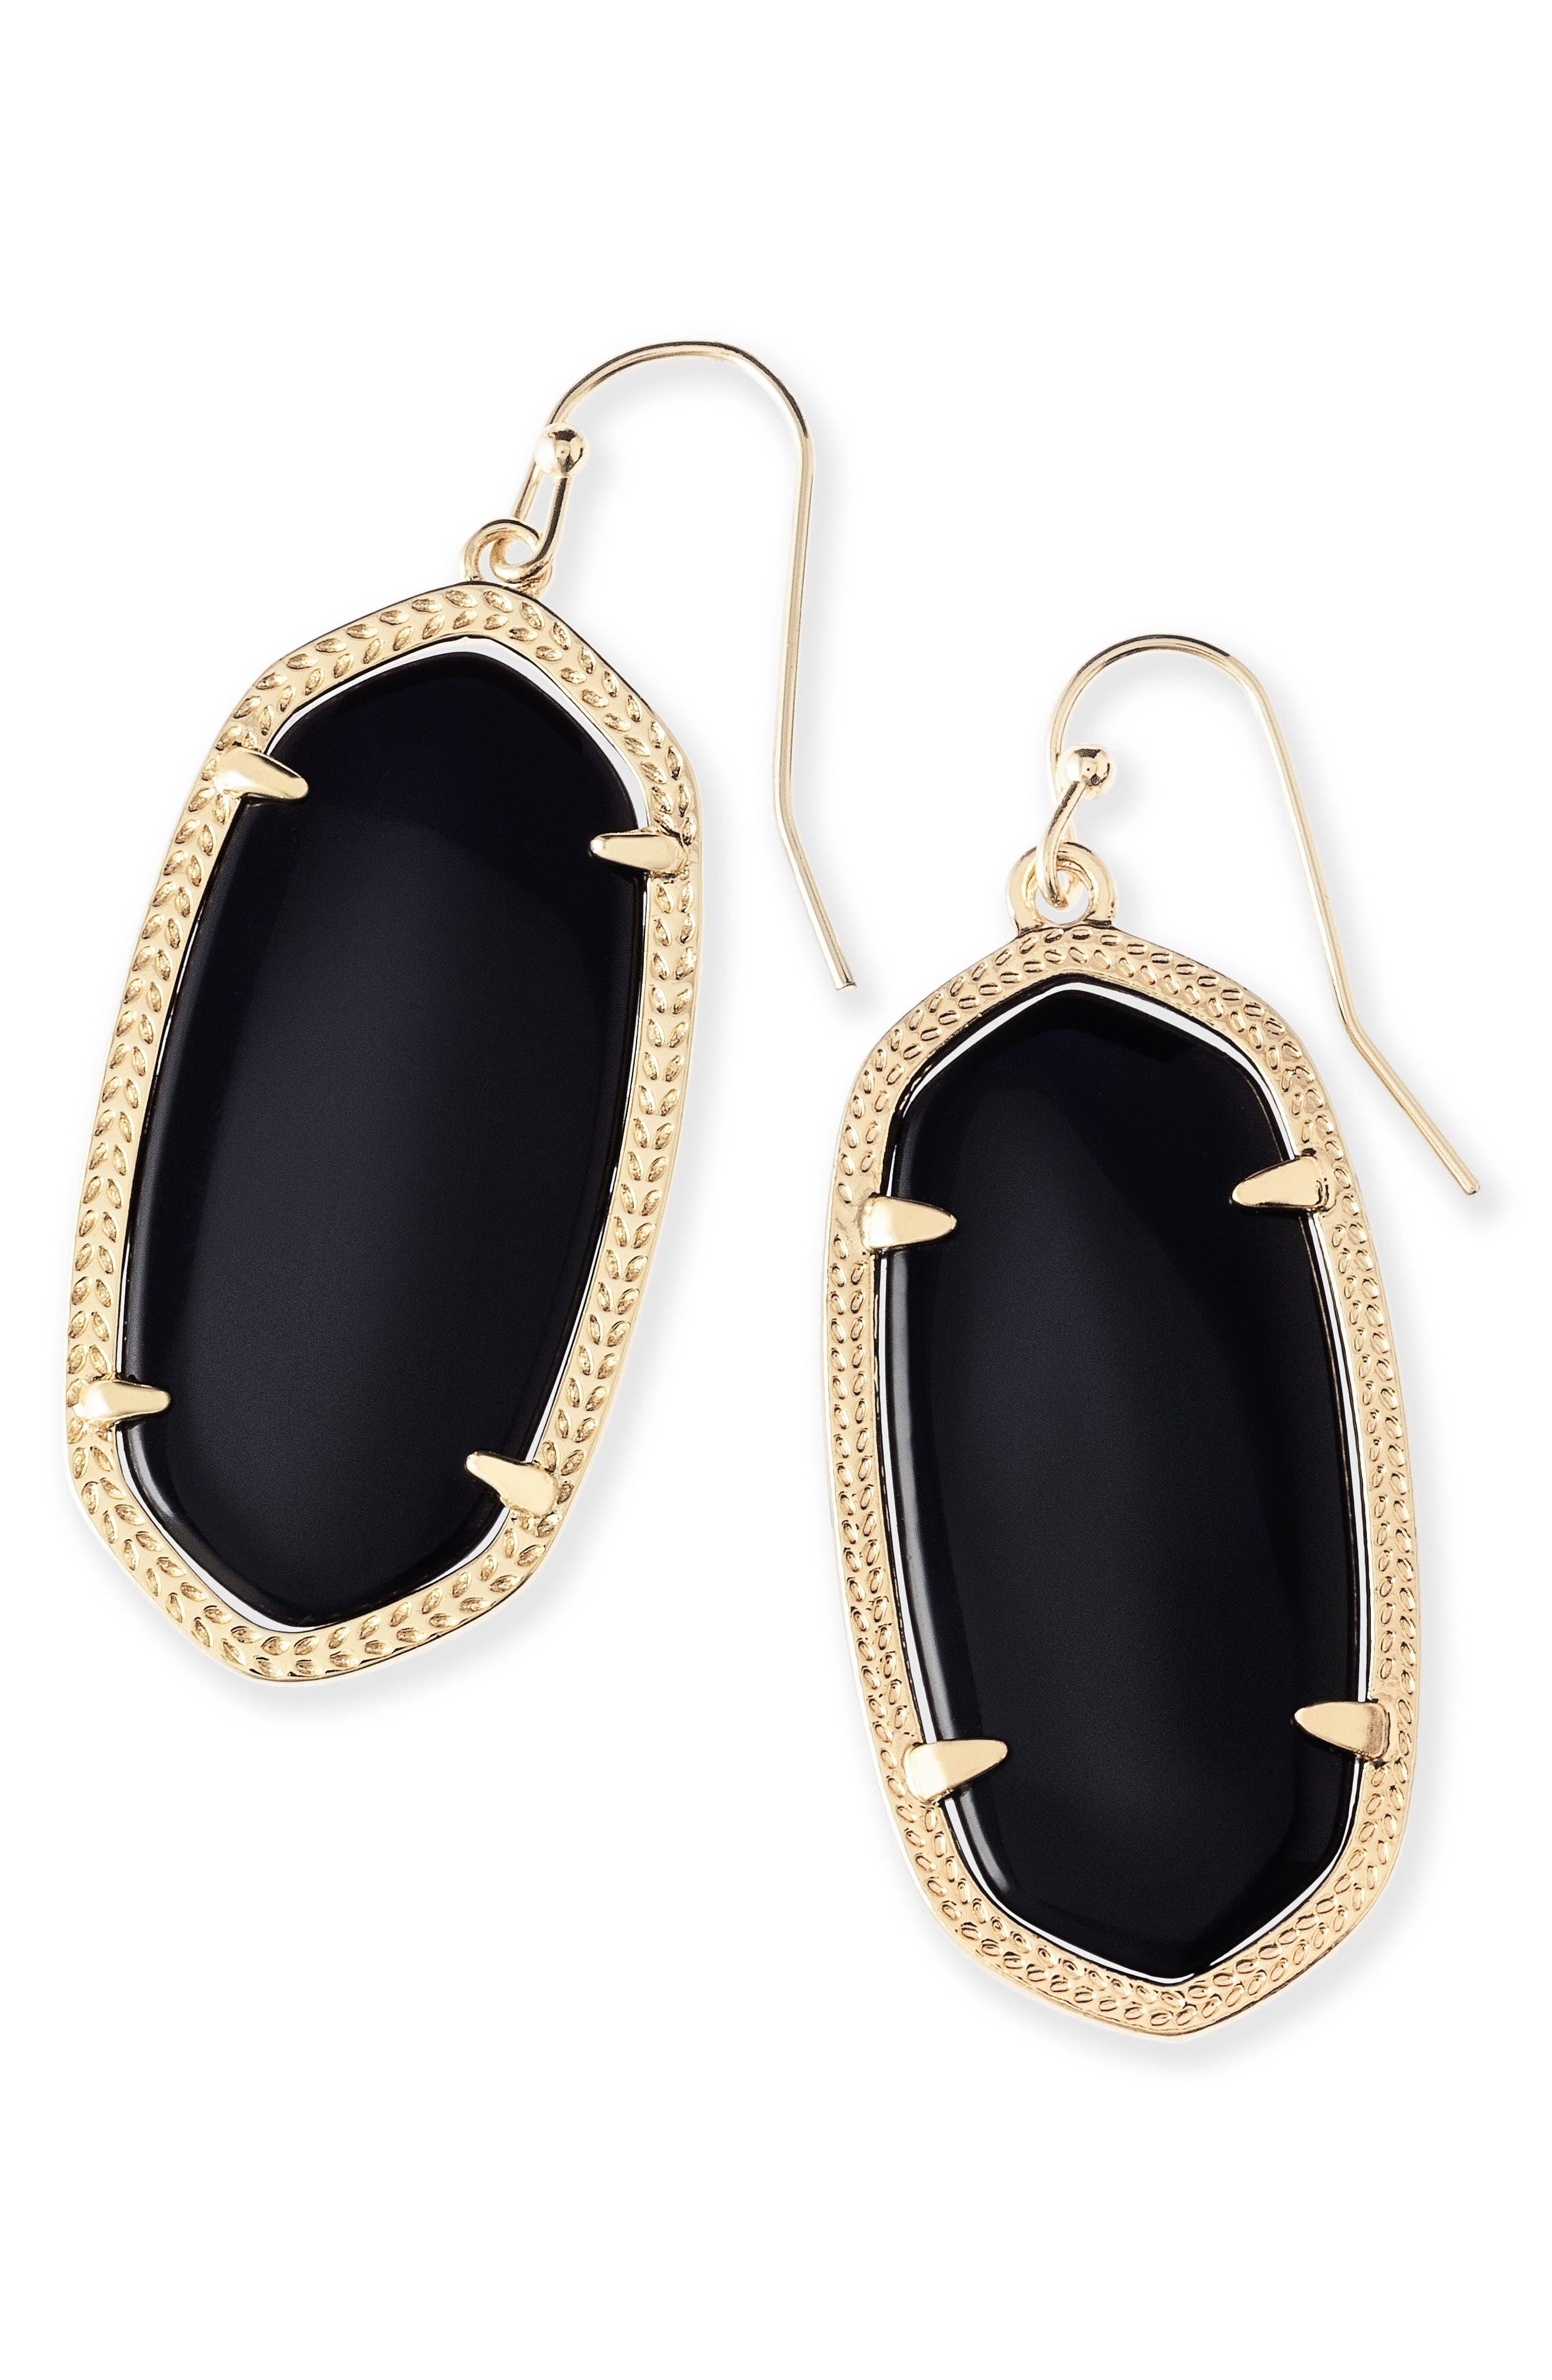 Elle Filigree Drop Earrings,                             Alternate thumbnail 4, color,                             BLACK/ GOLD